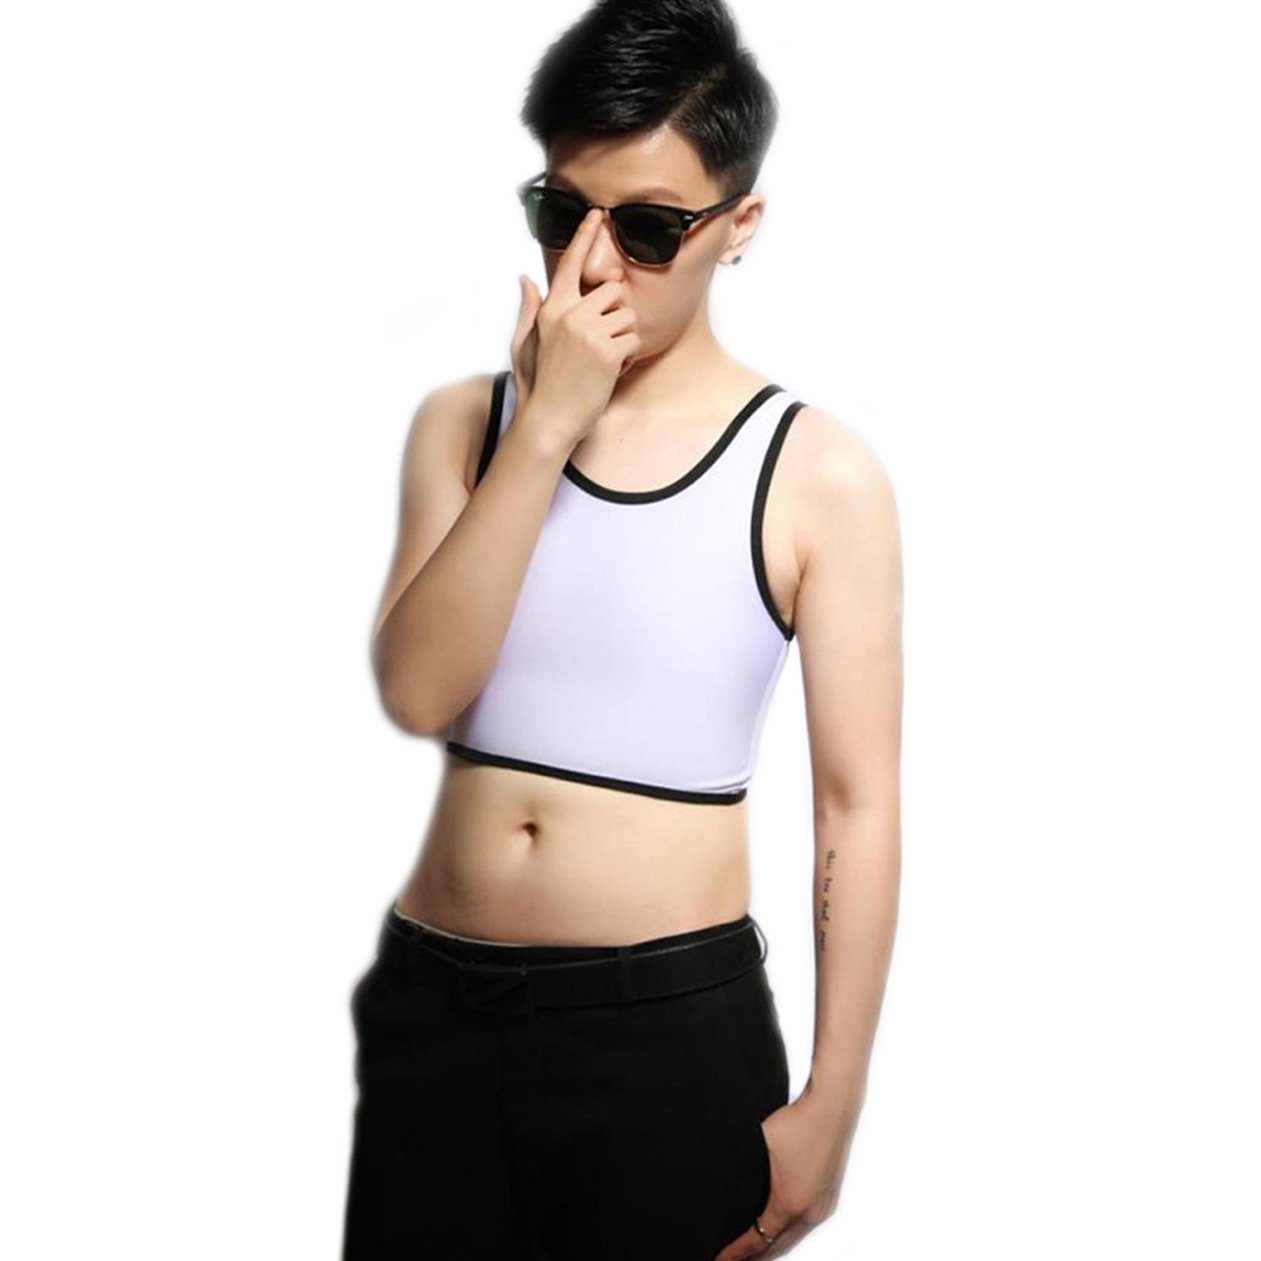 BaronHong Tomboy Trans Lesbian Mesh Chest Binder Corsetto Plus Size Short Canotta Colorata